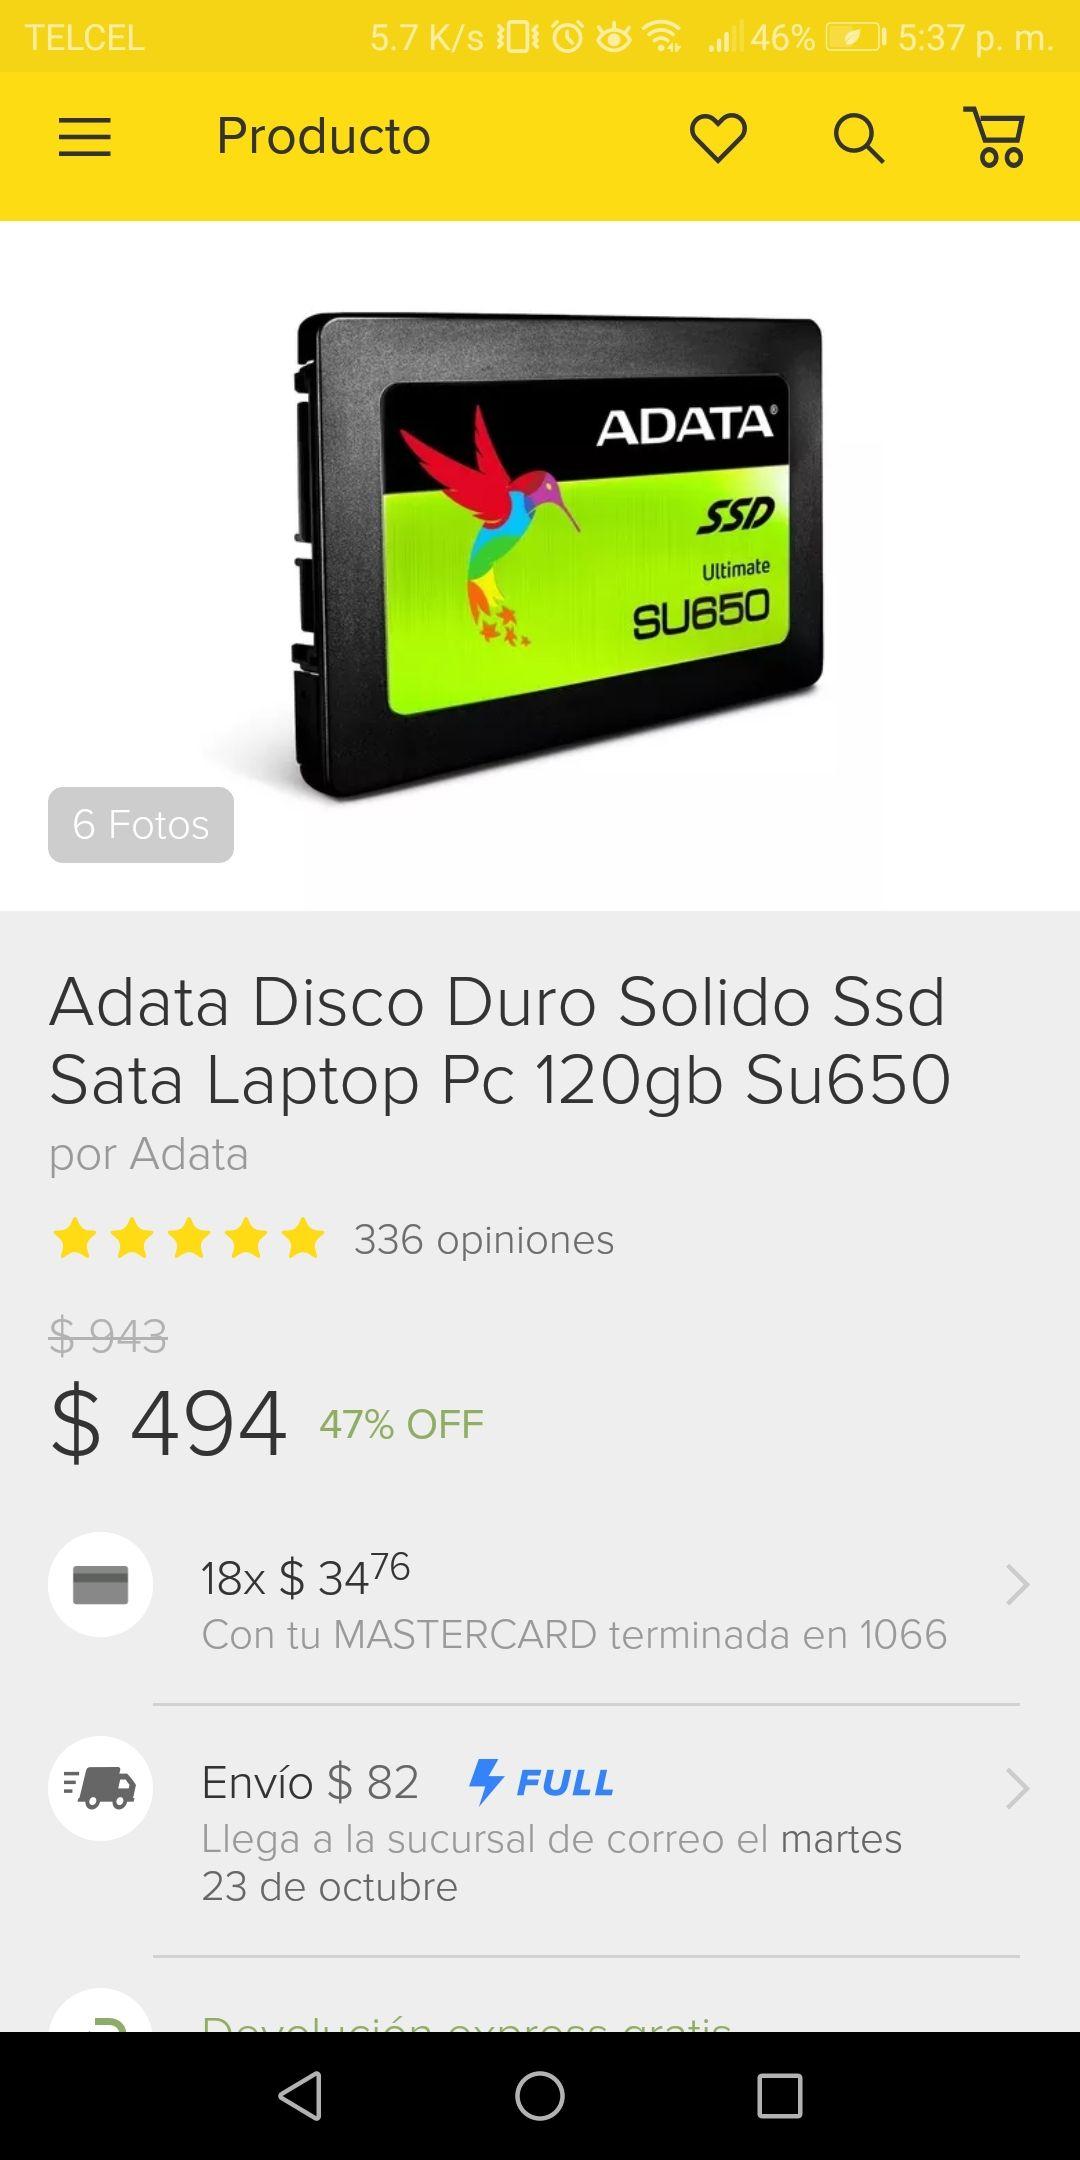 Tienda Oficial de Mercado Libre: Adata disco duro sólido ssd sata laptop PC 120GB